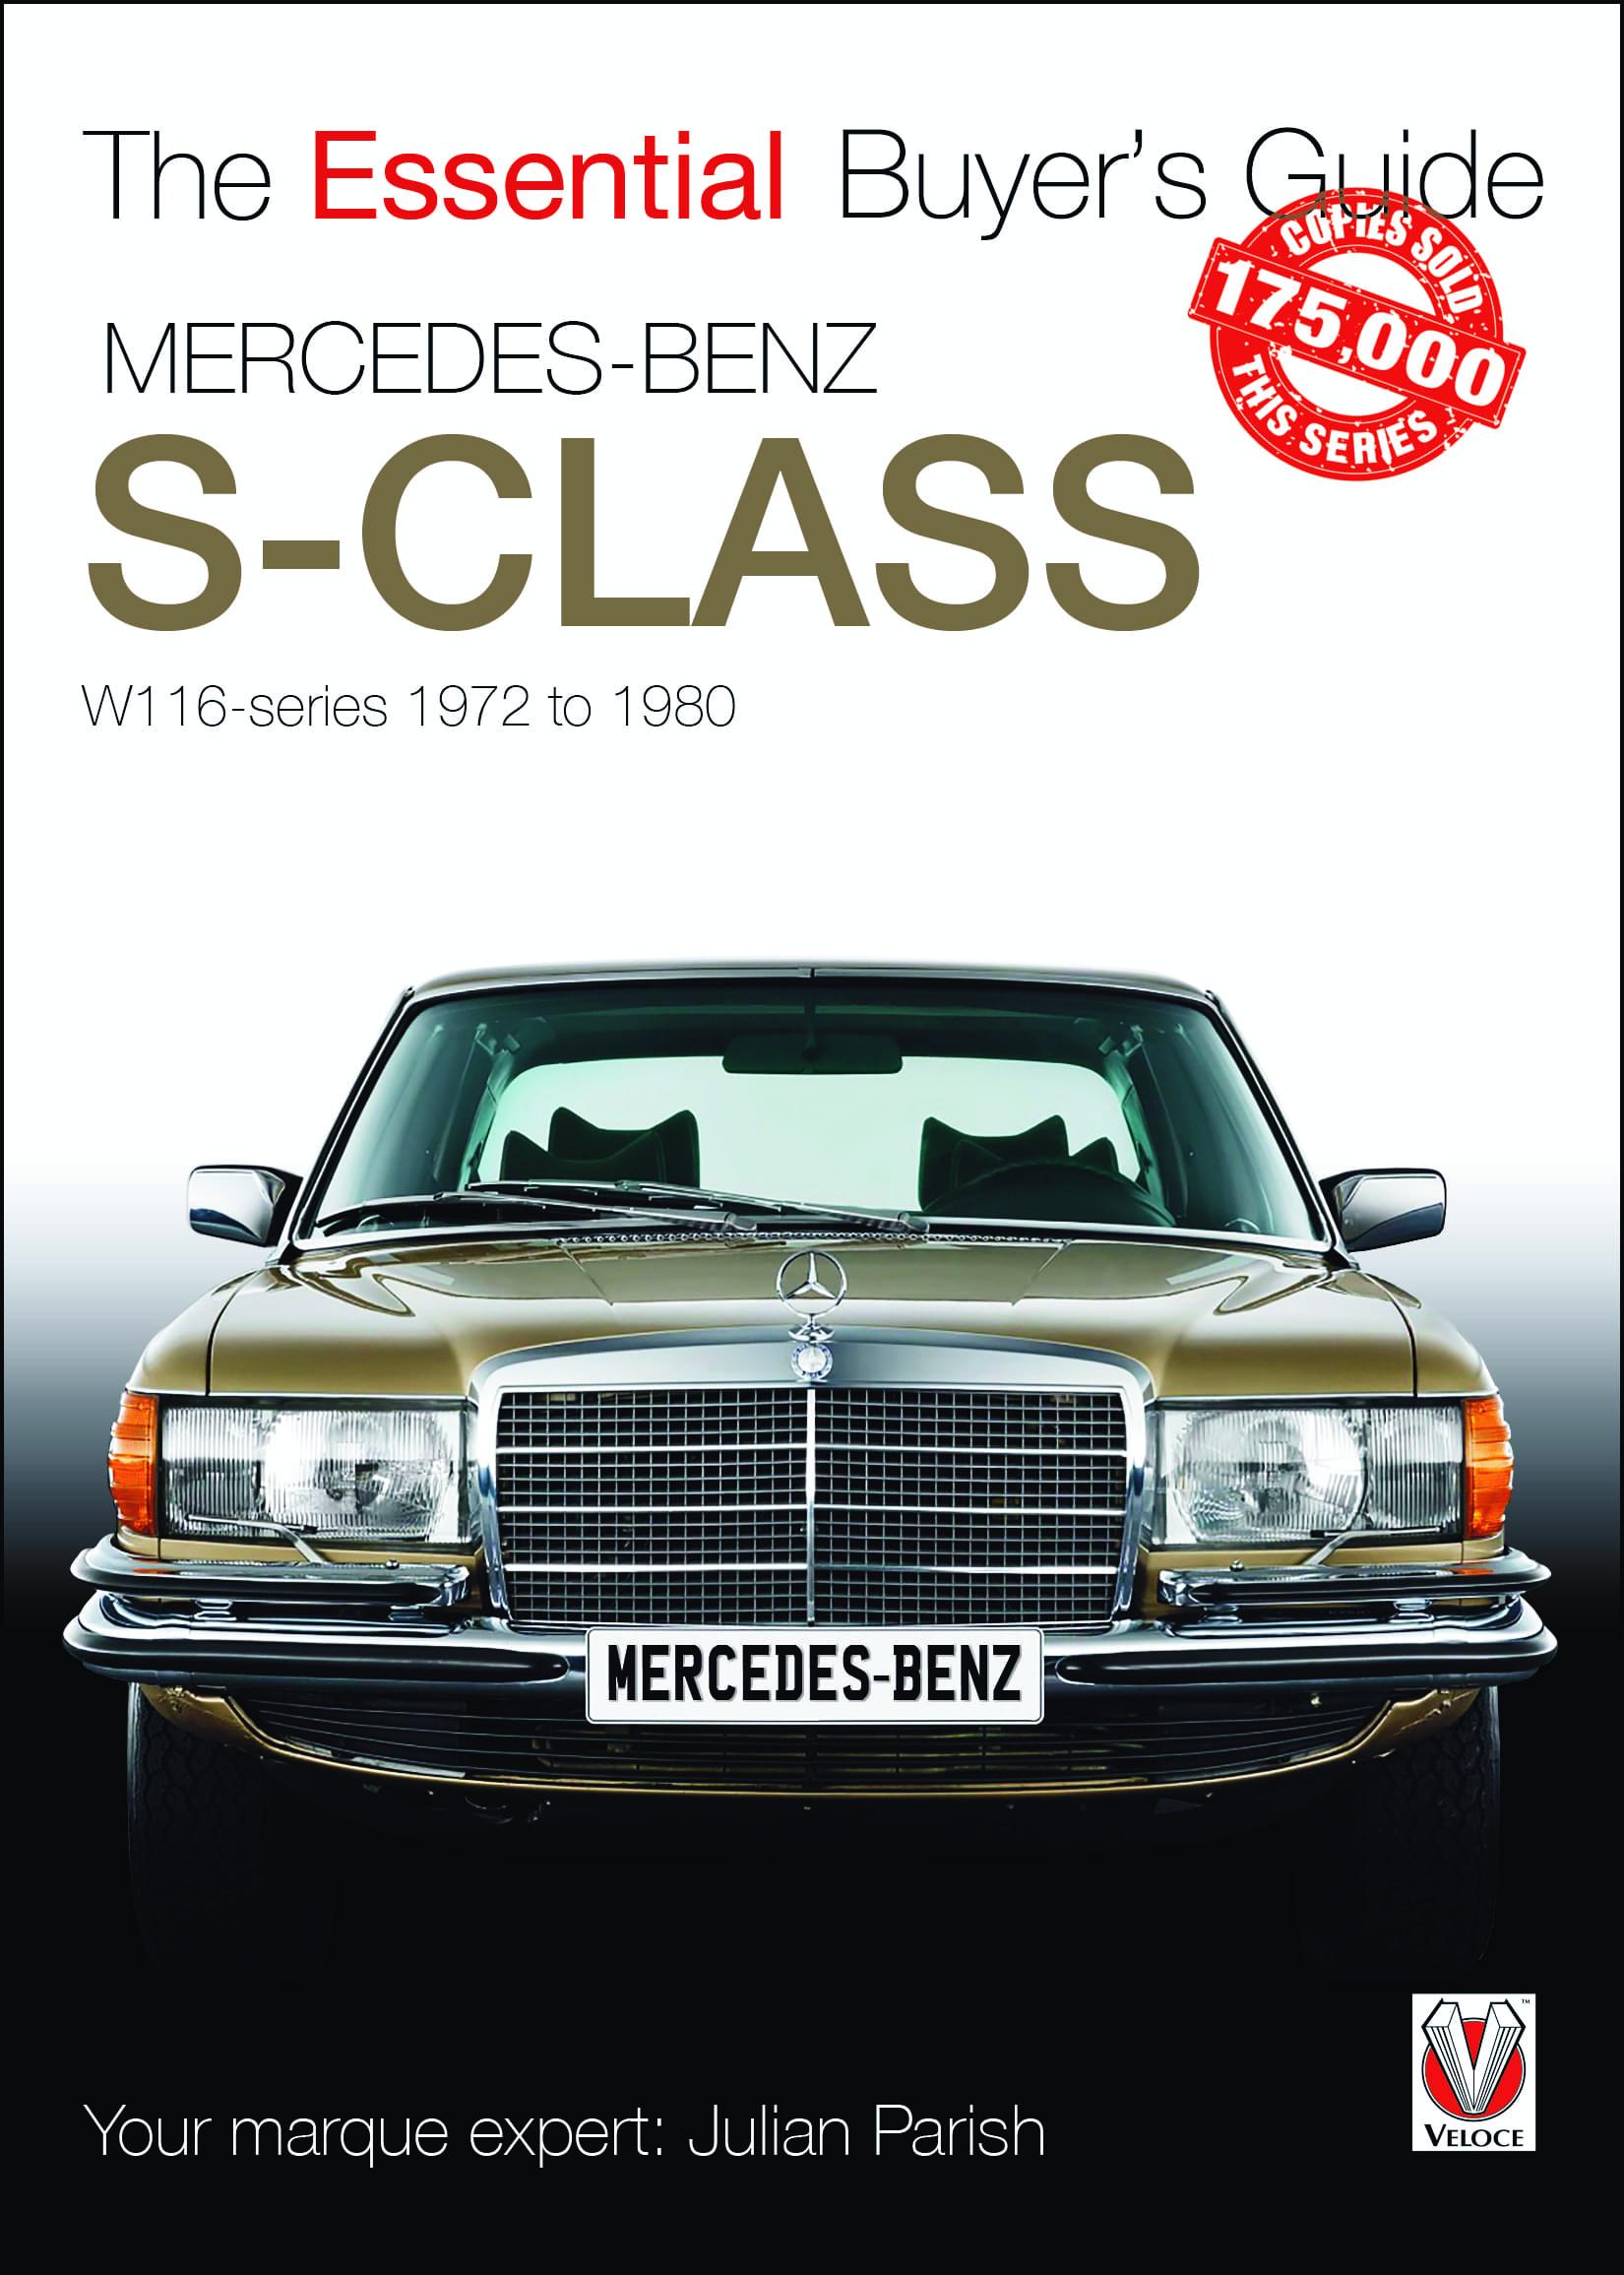 Mercedes Benz S-Class 1972-1980 (W116) EBG  cover